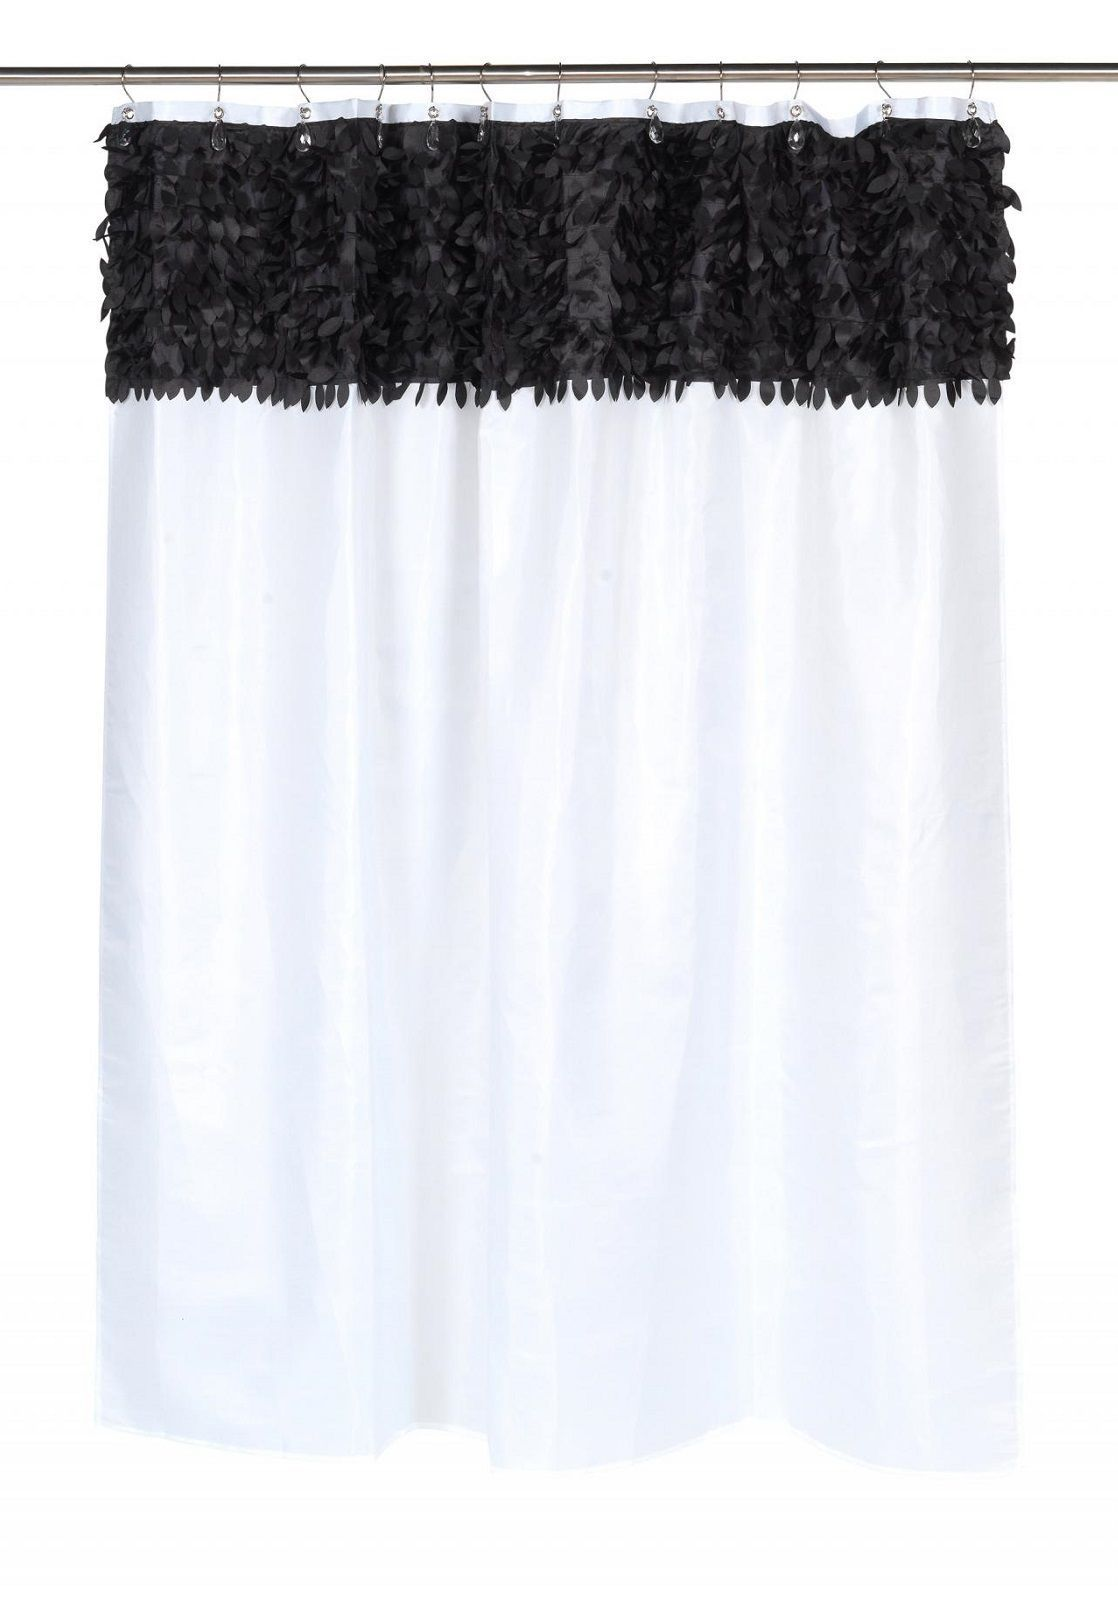 Шторки для ванной Шторка для ванной 178x183 Carnation Home Fashions Jasmine White-Black elitnaya-shtorka-dlya-vannoy-jasmine-white-black-ot-carnation-home-fashions-ssha-kitay.jpg